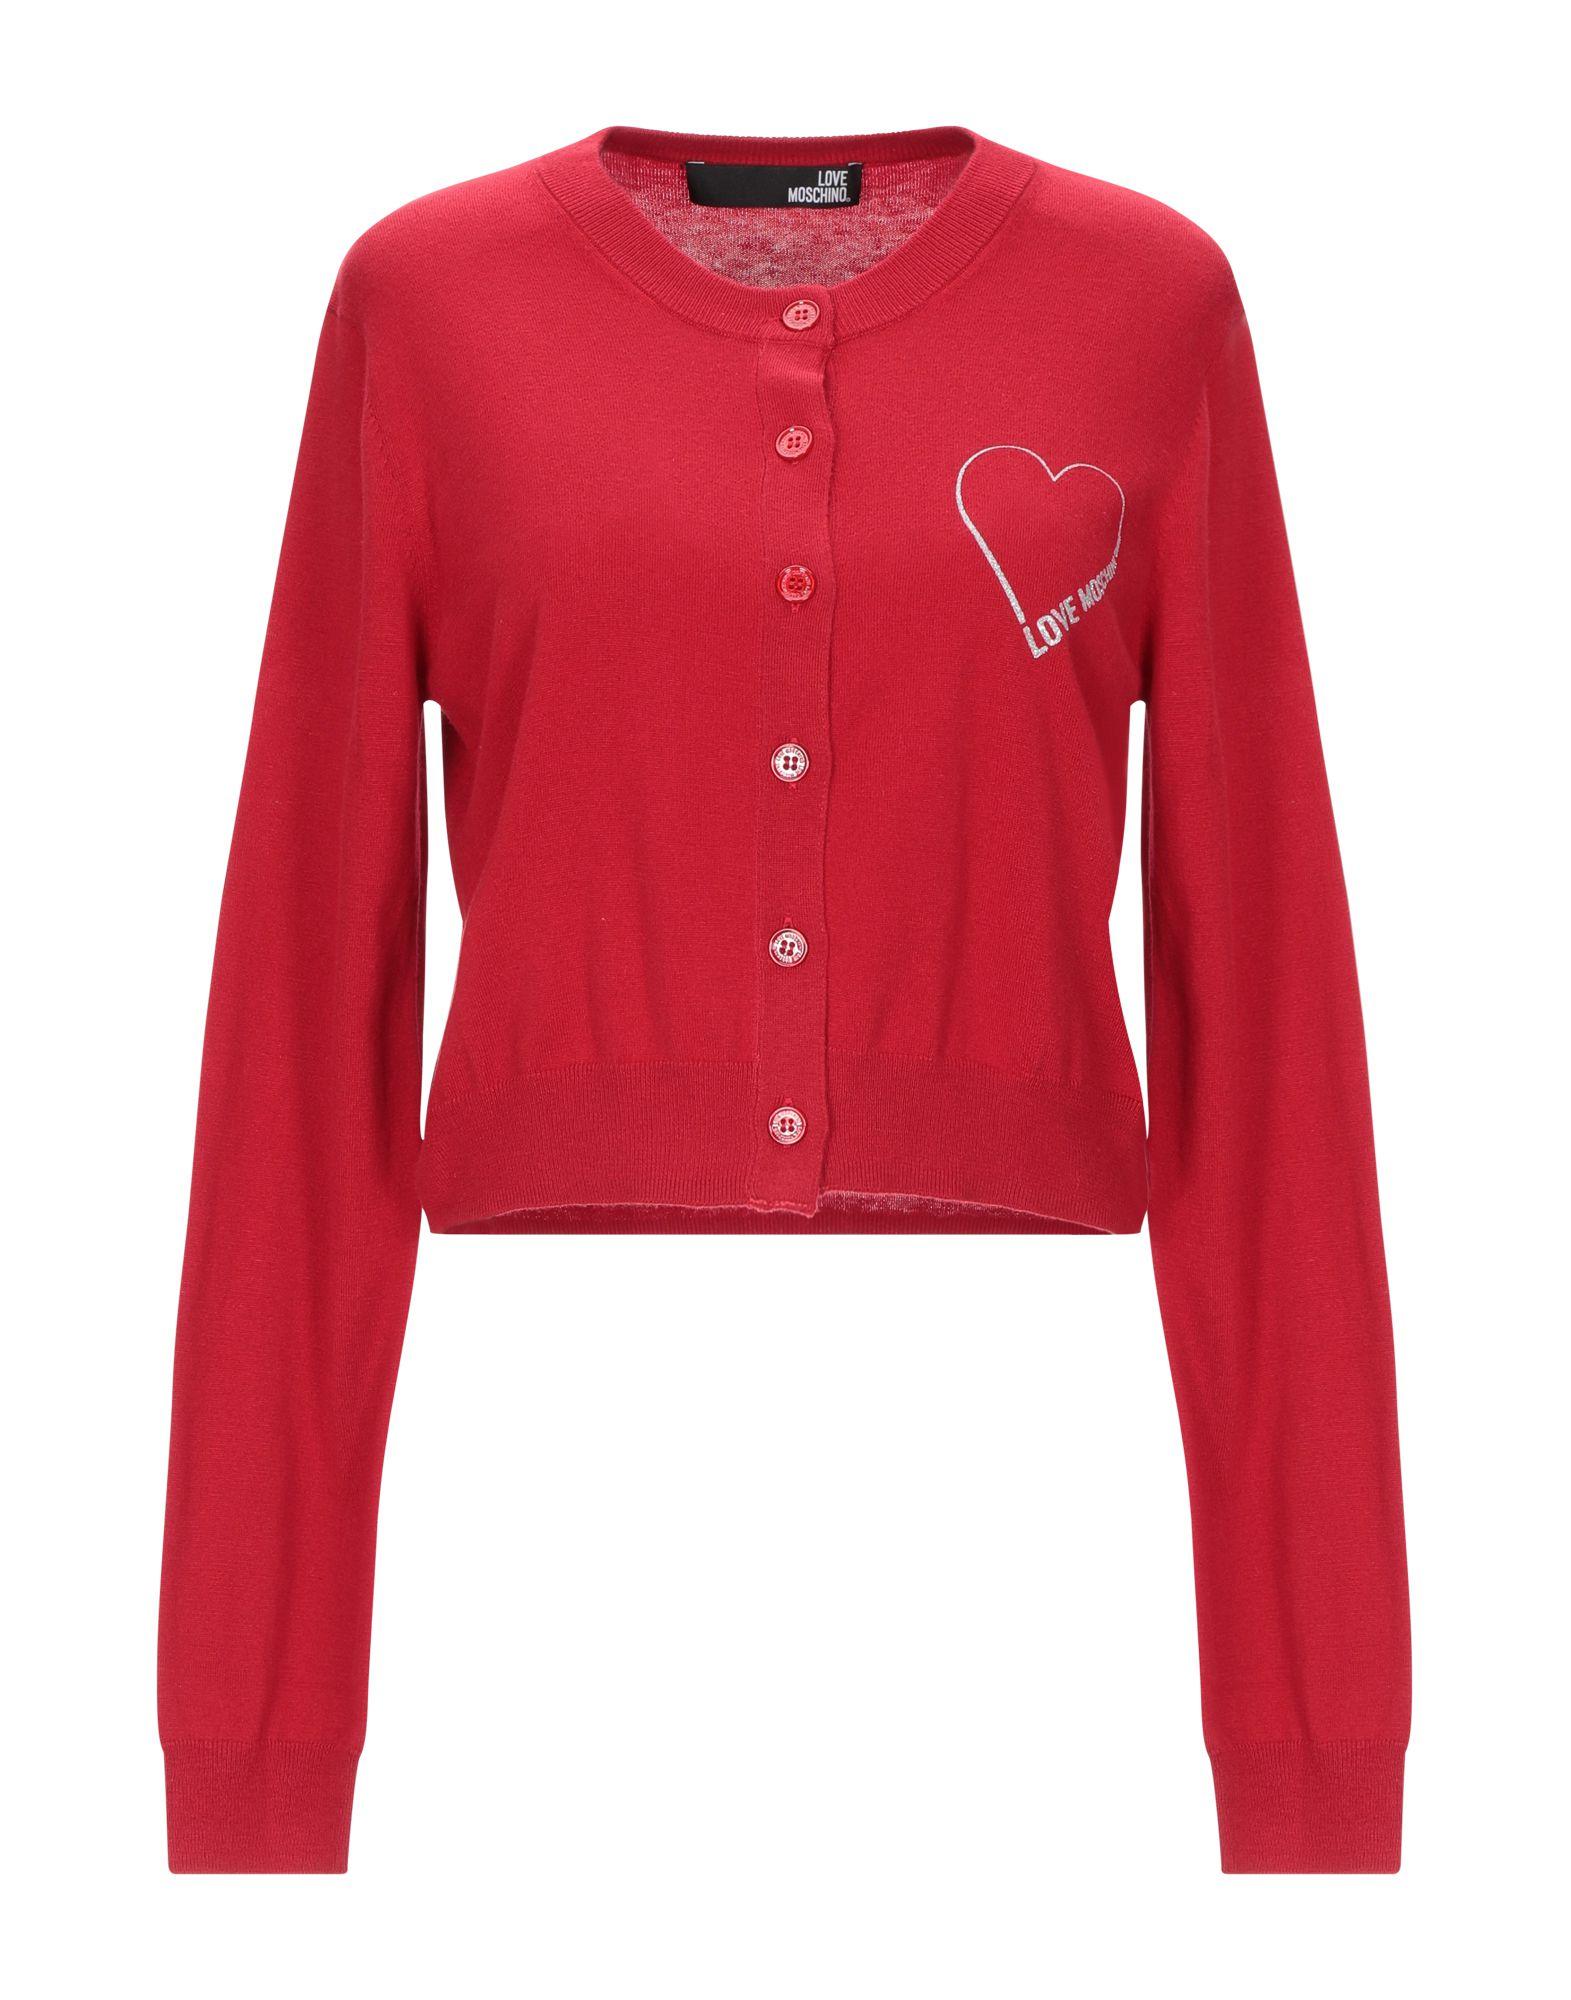 LOVE MOSCHINO Cardigans - Item 14007108